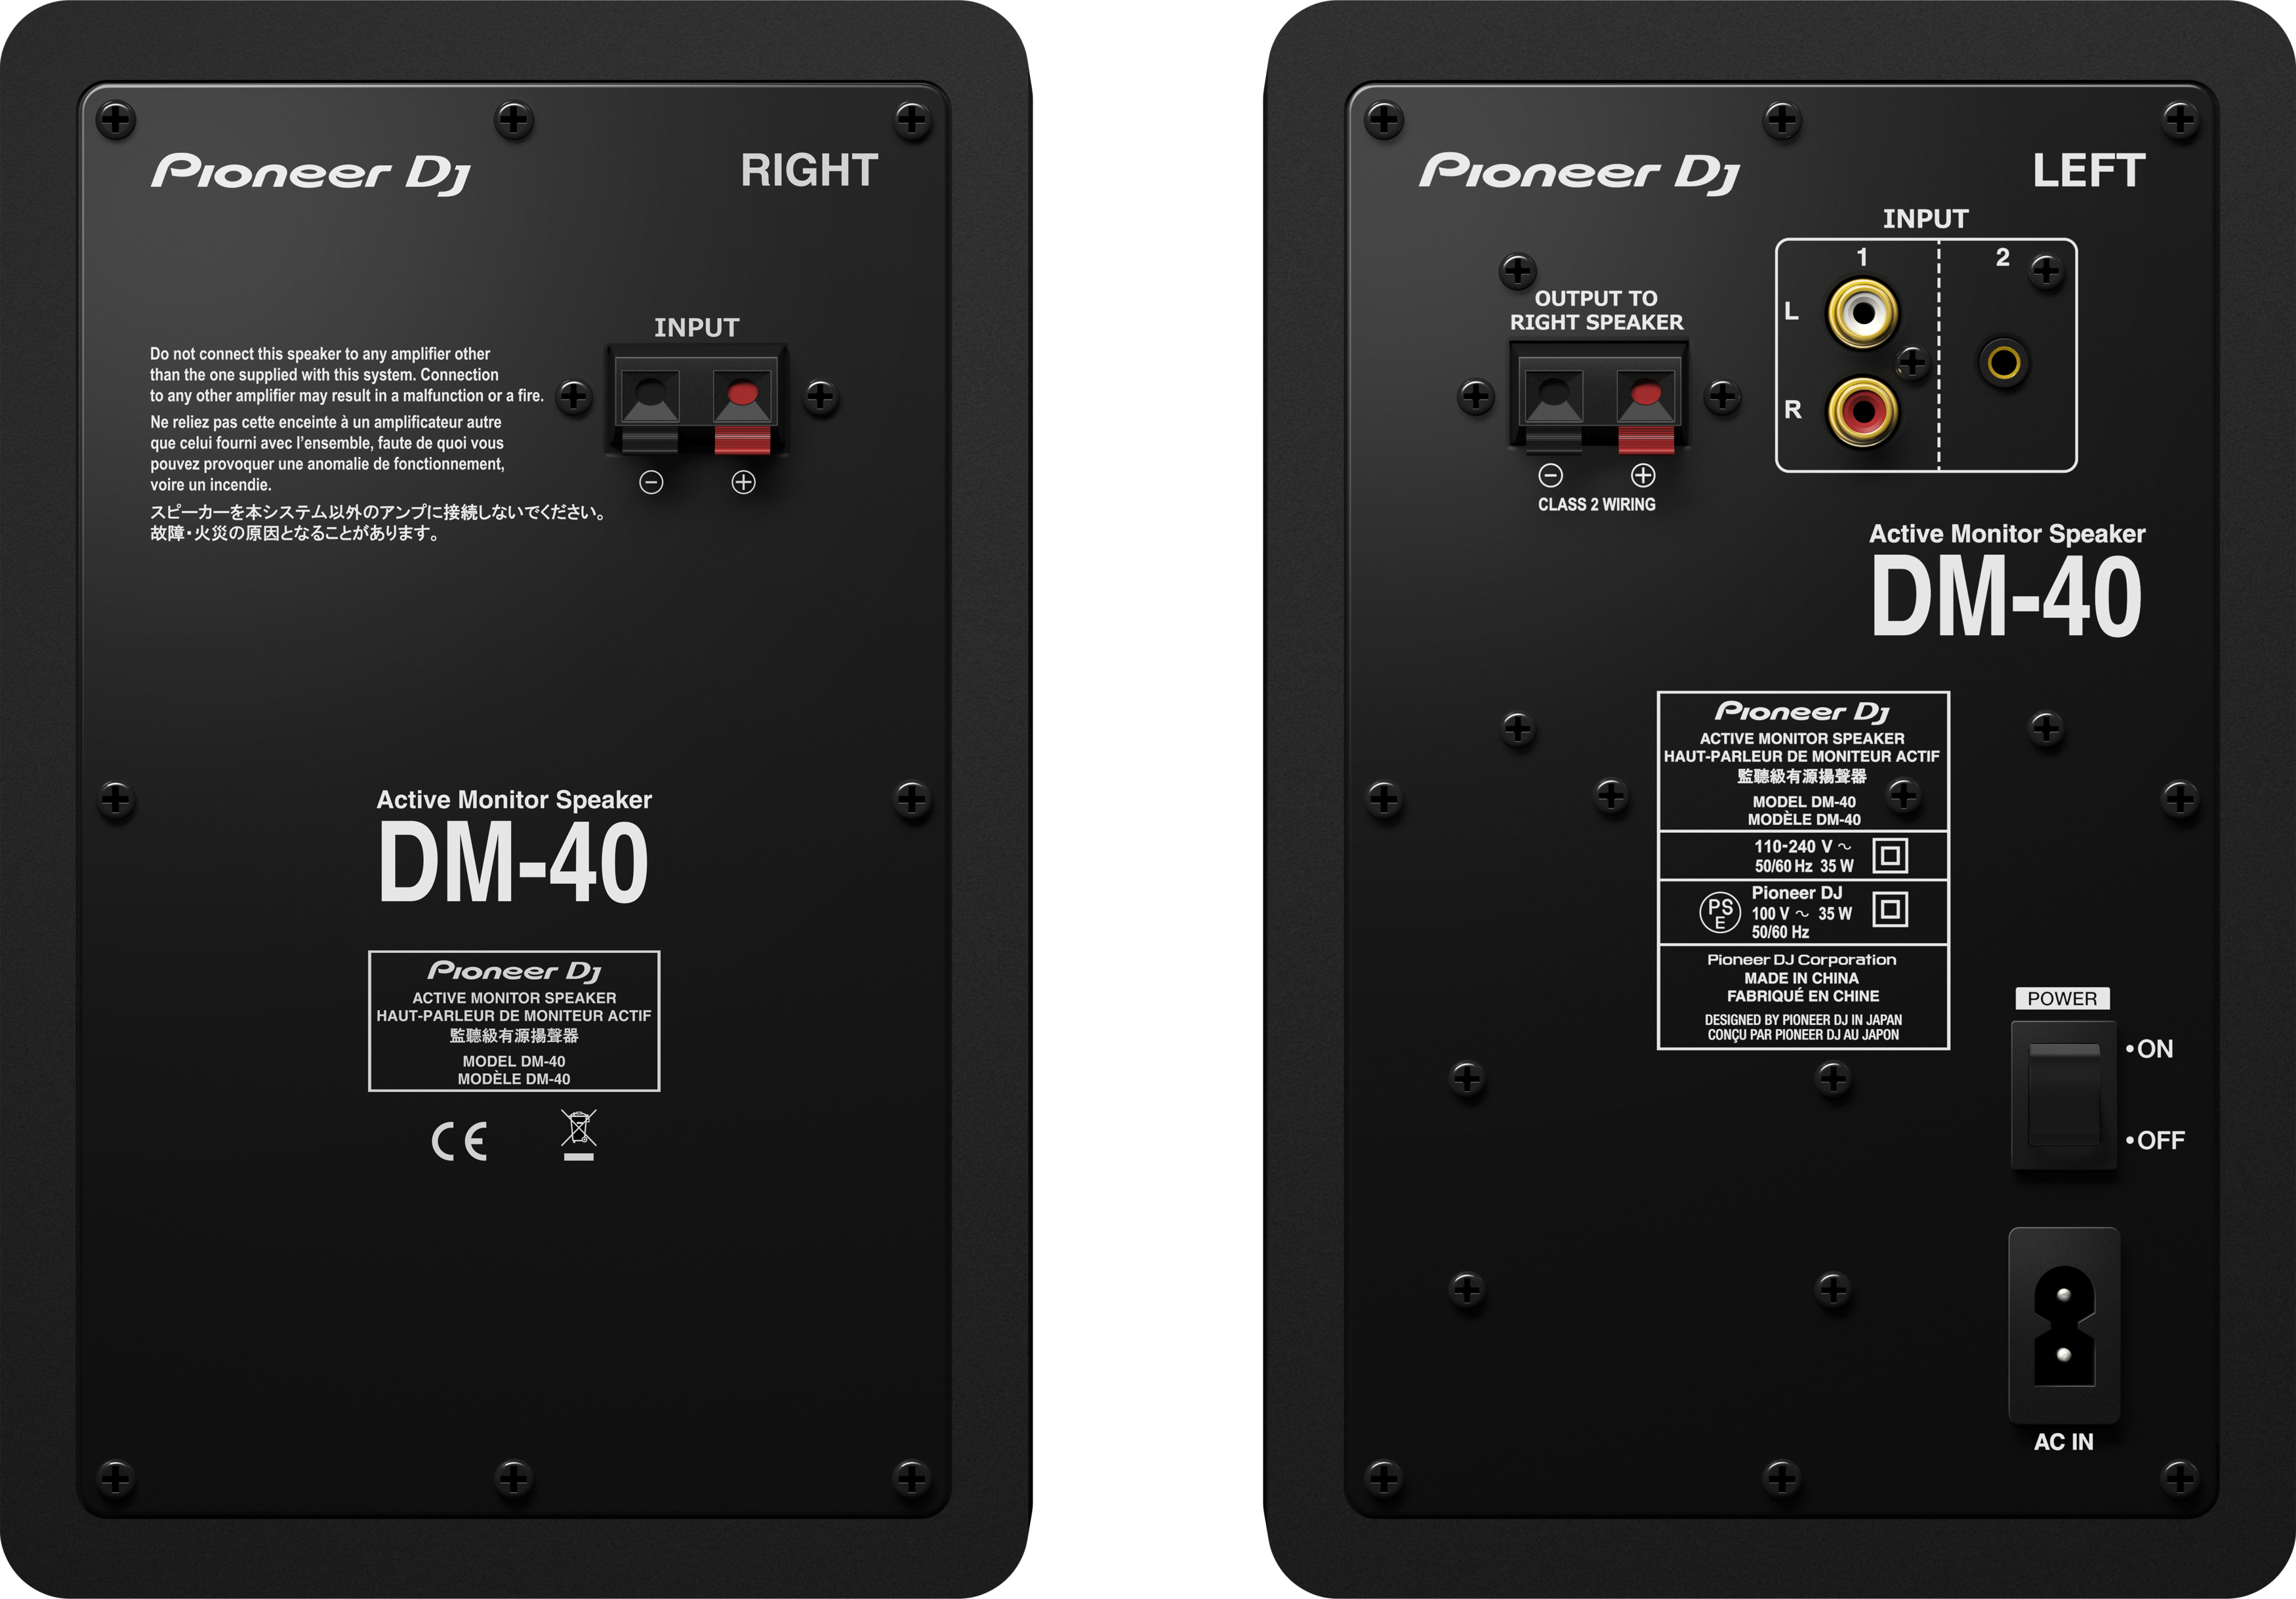 DM-40